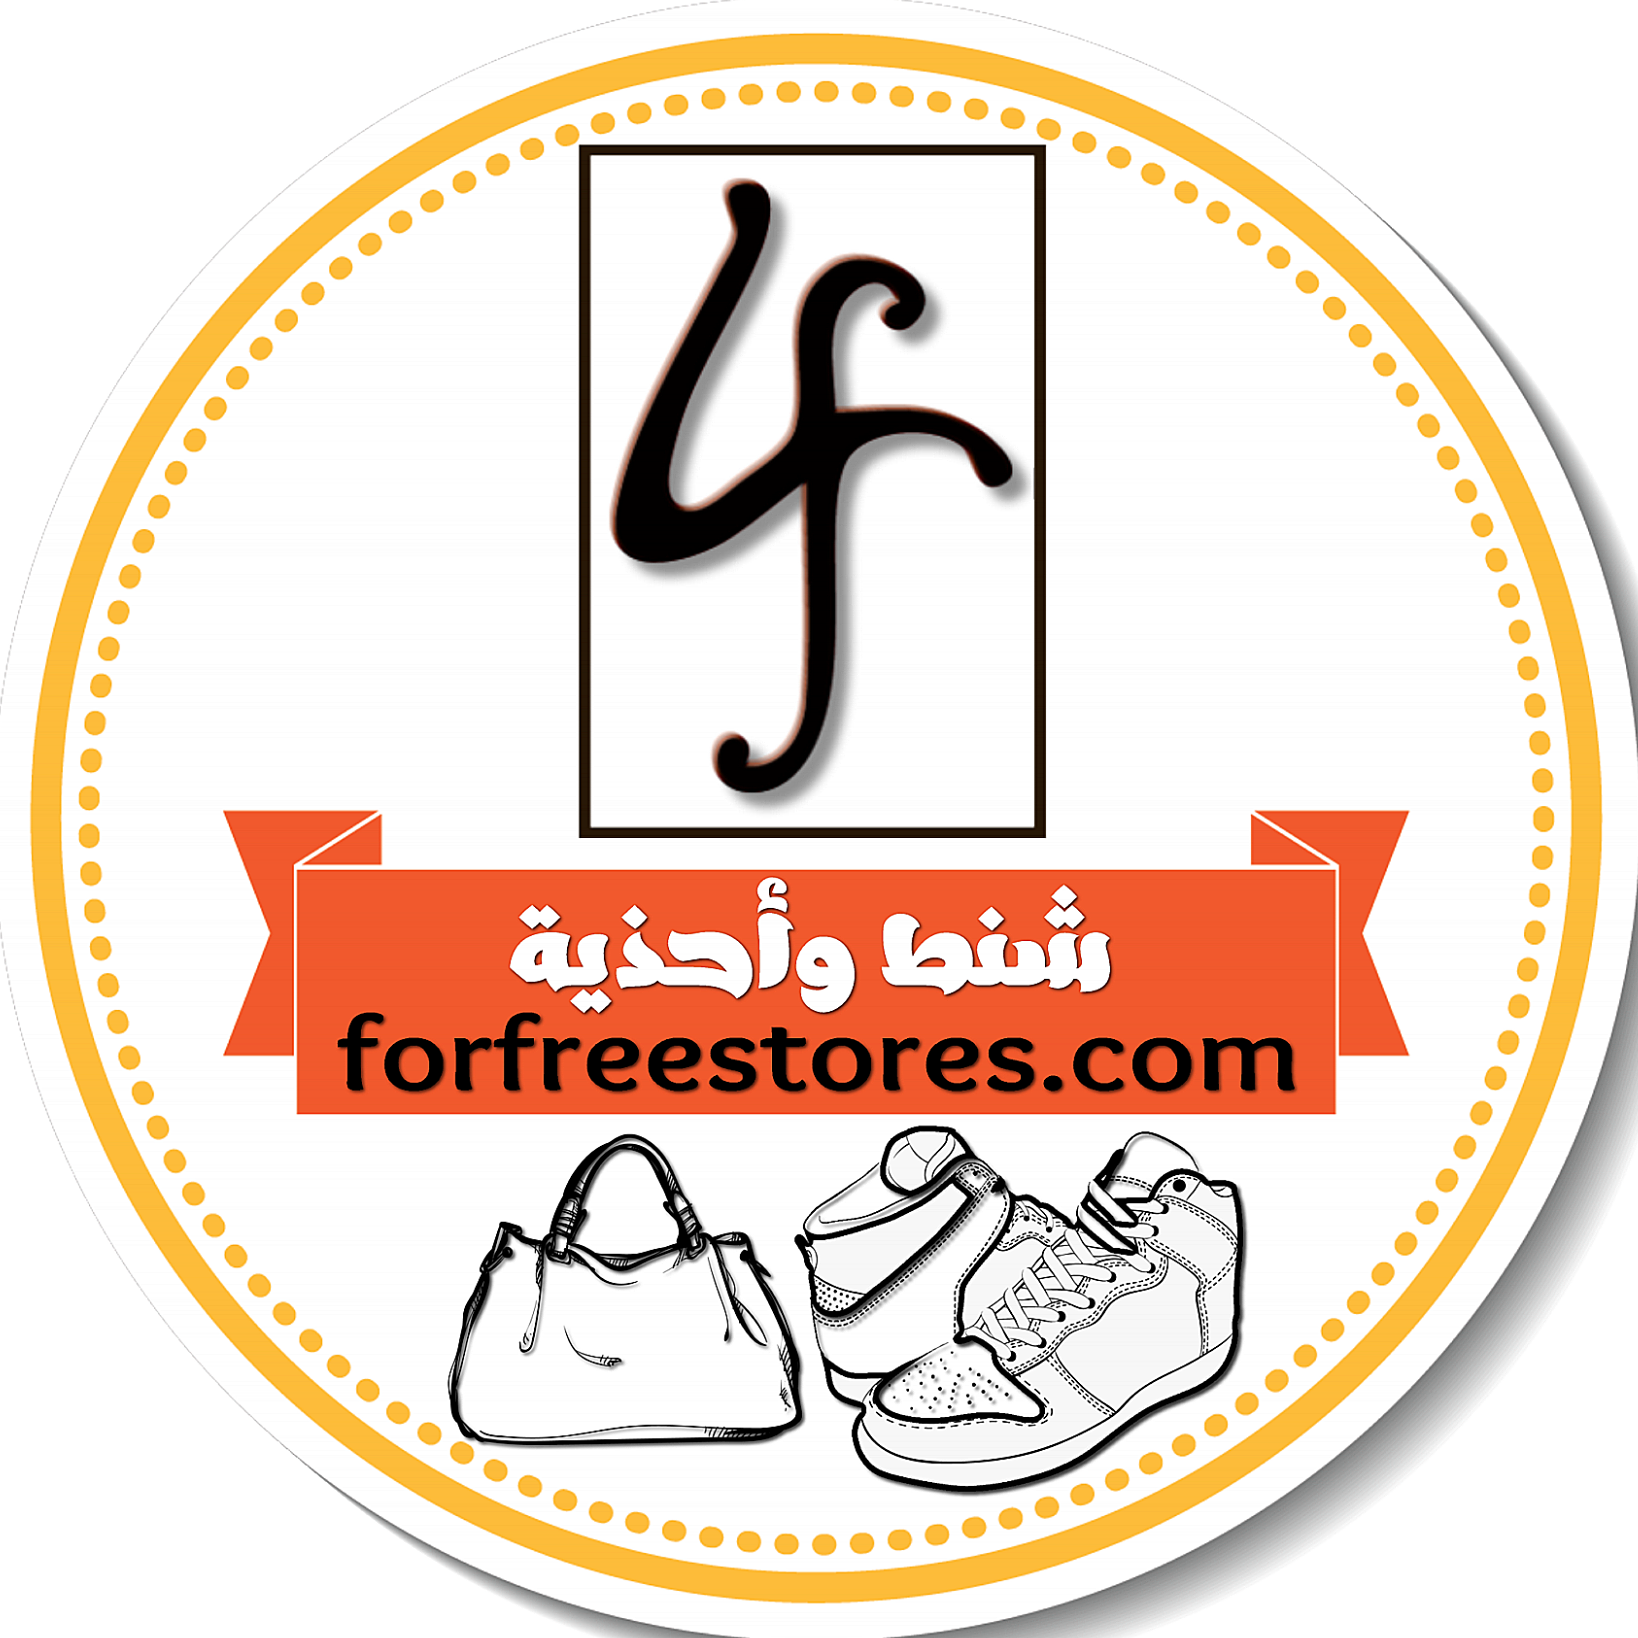 فور فري ستورز For Free Stores